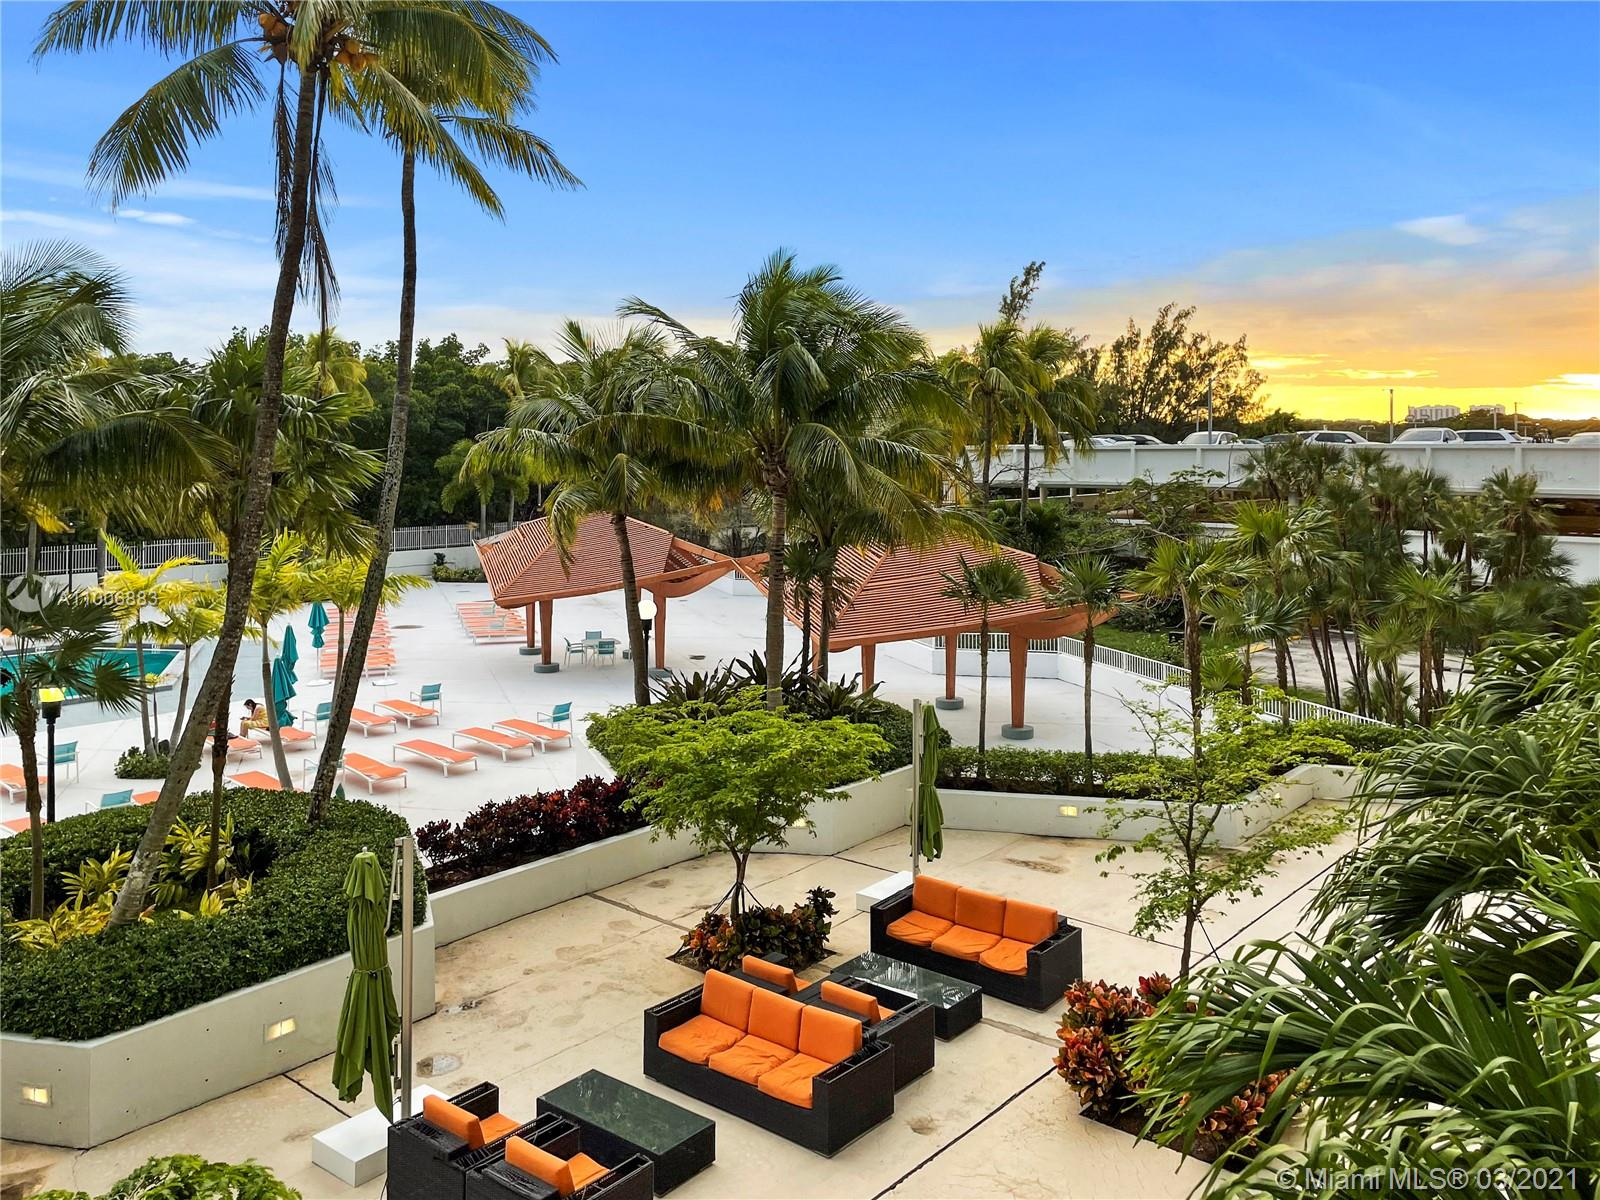 Arlen House #224 - 100 Bayview Dr #224, Sunny Isles Beach, FL 33160